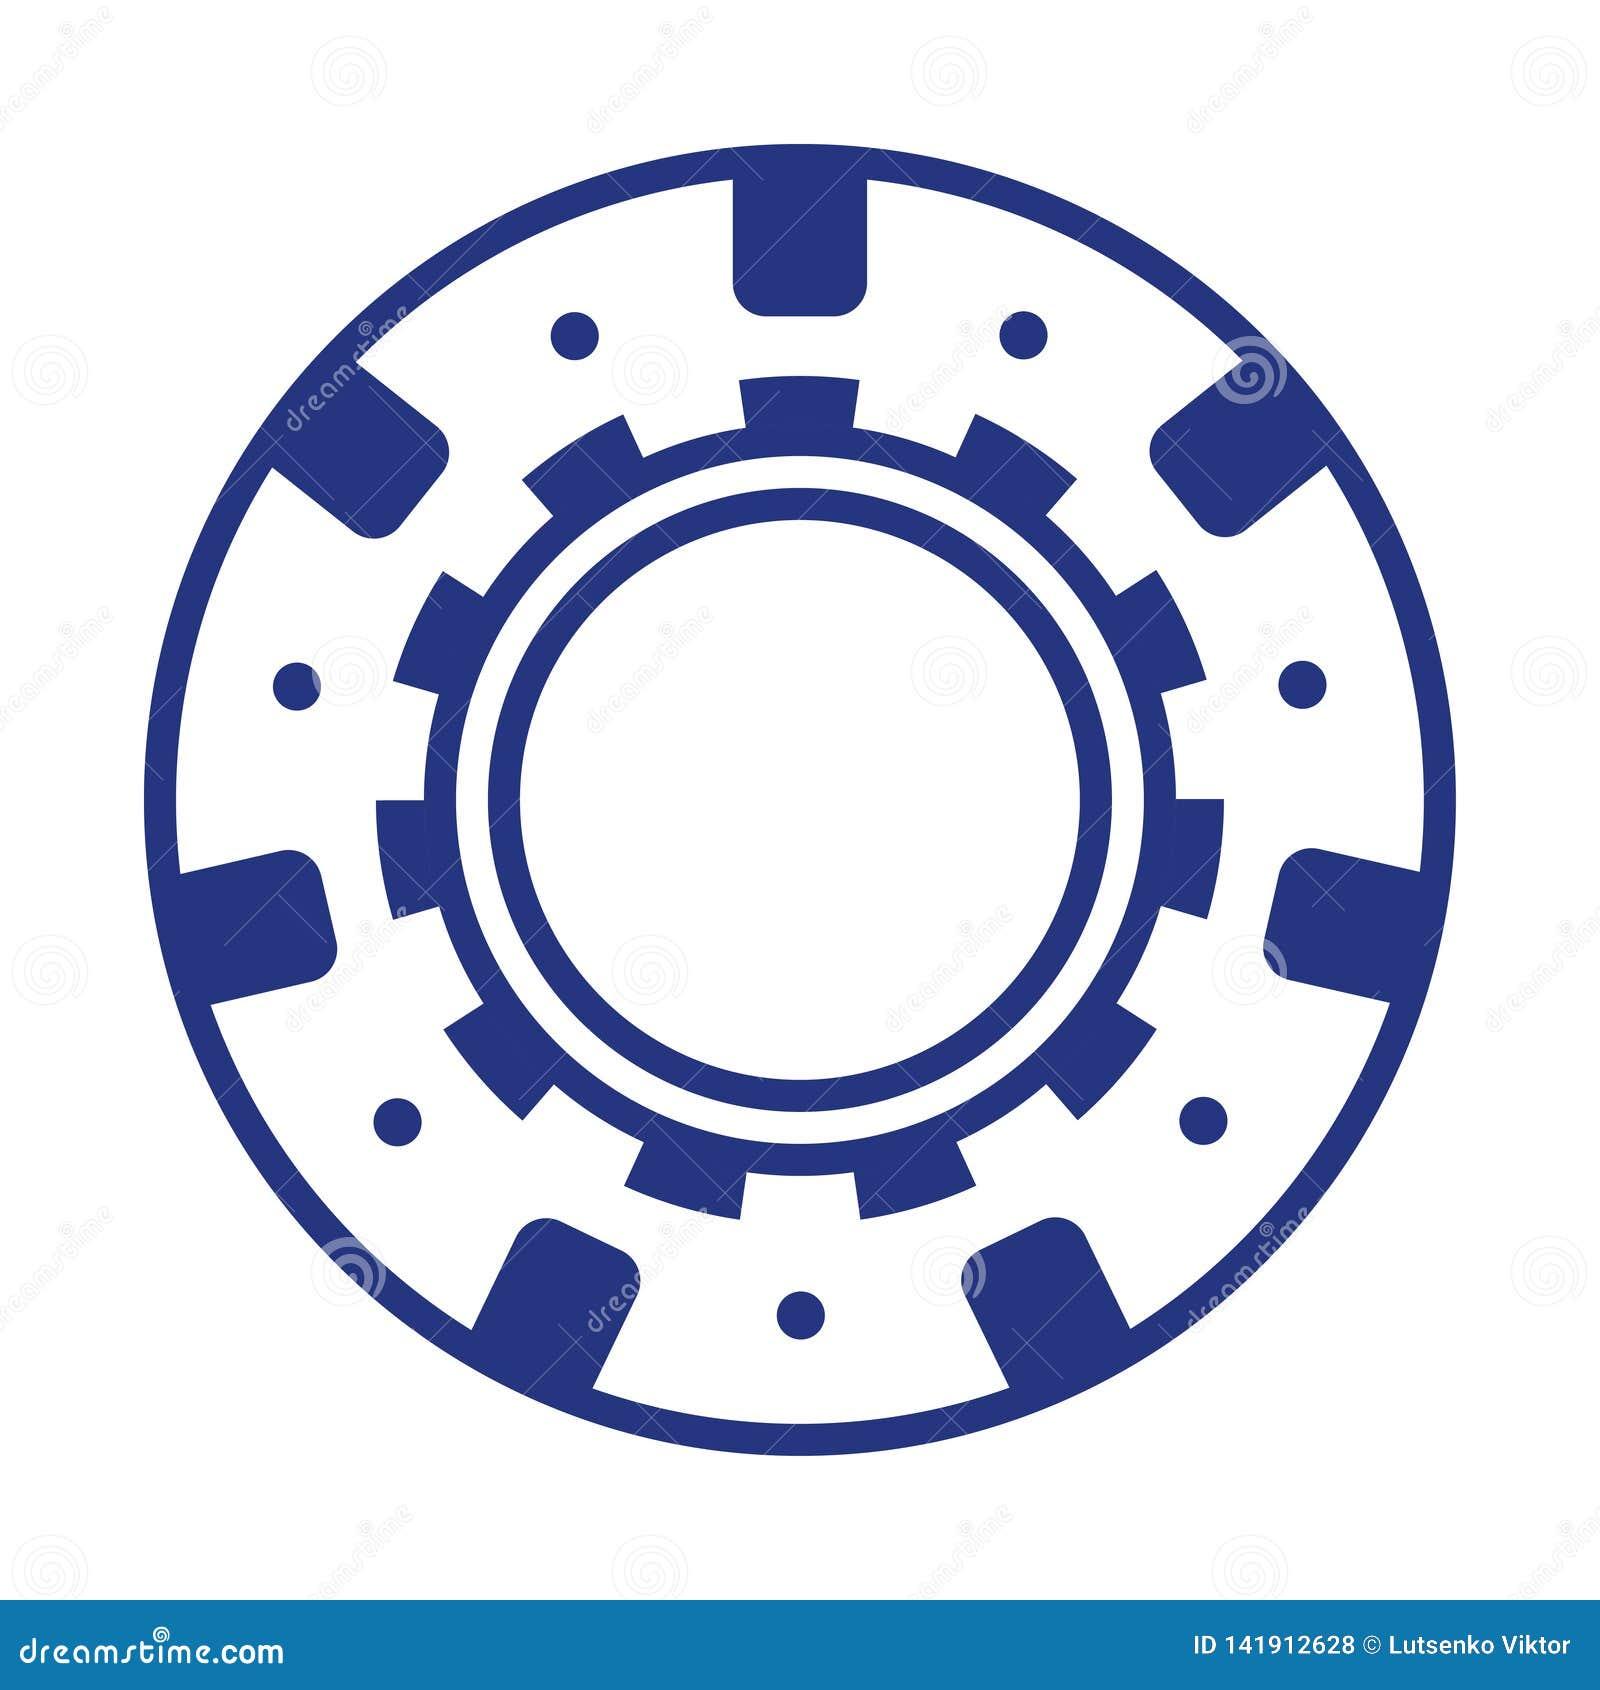 Cool blue casino poker chip